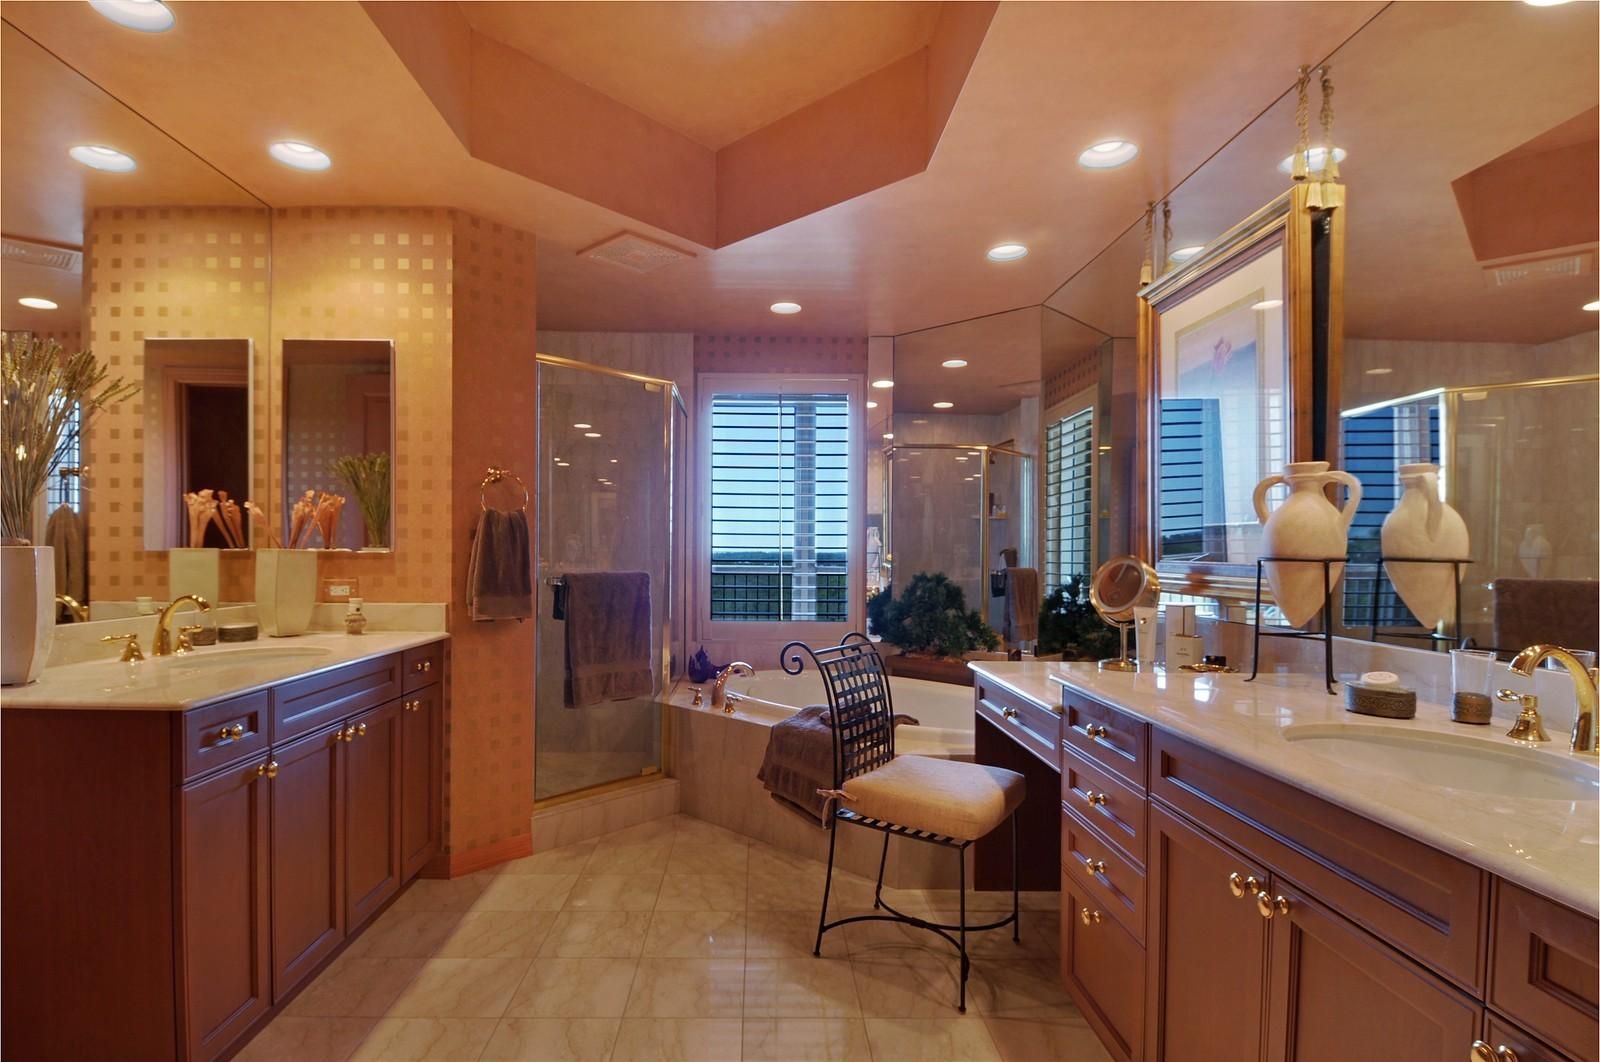 Real Estate Photography - 4875 Pelican Colony Blvd, Unit 304, Bonita Springs, FL, 34134 - Master Bathroom